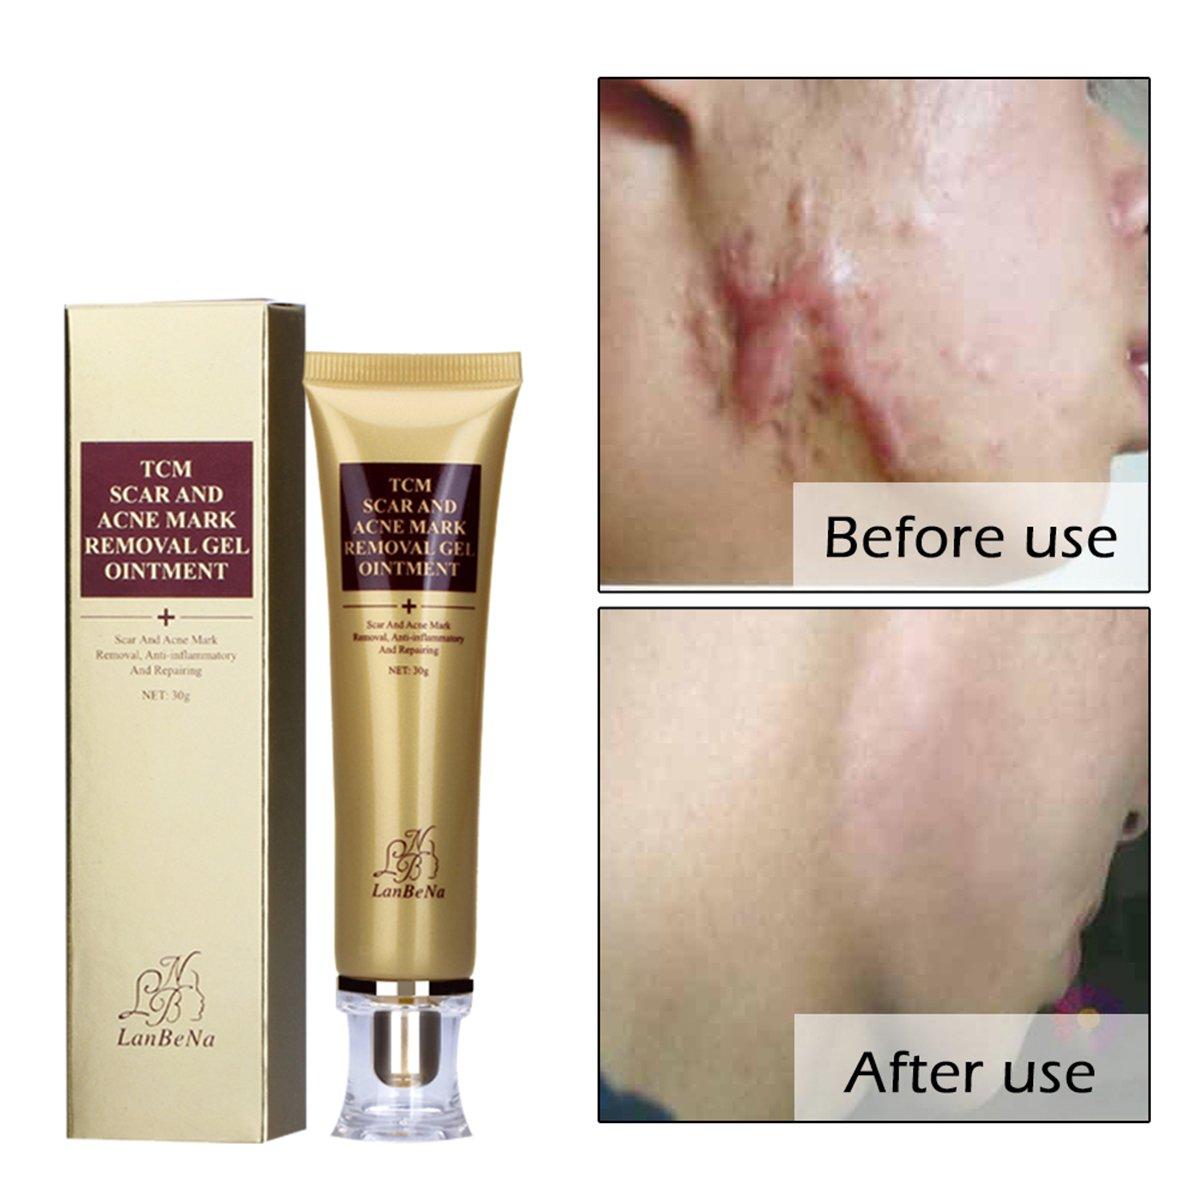 Amareu Acne Scar Removal Cream Skin Repair Face Cream For Burns Cuts Operation Stretch Mark Remover Acne Scars Treatment